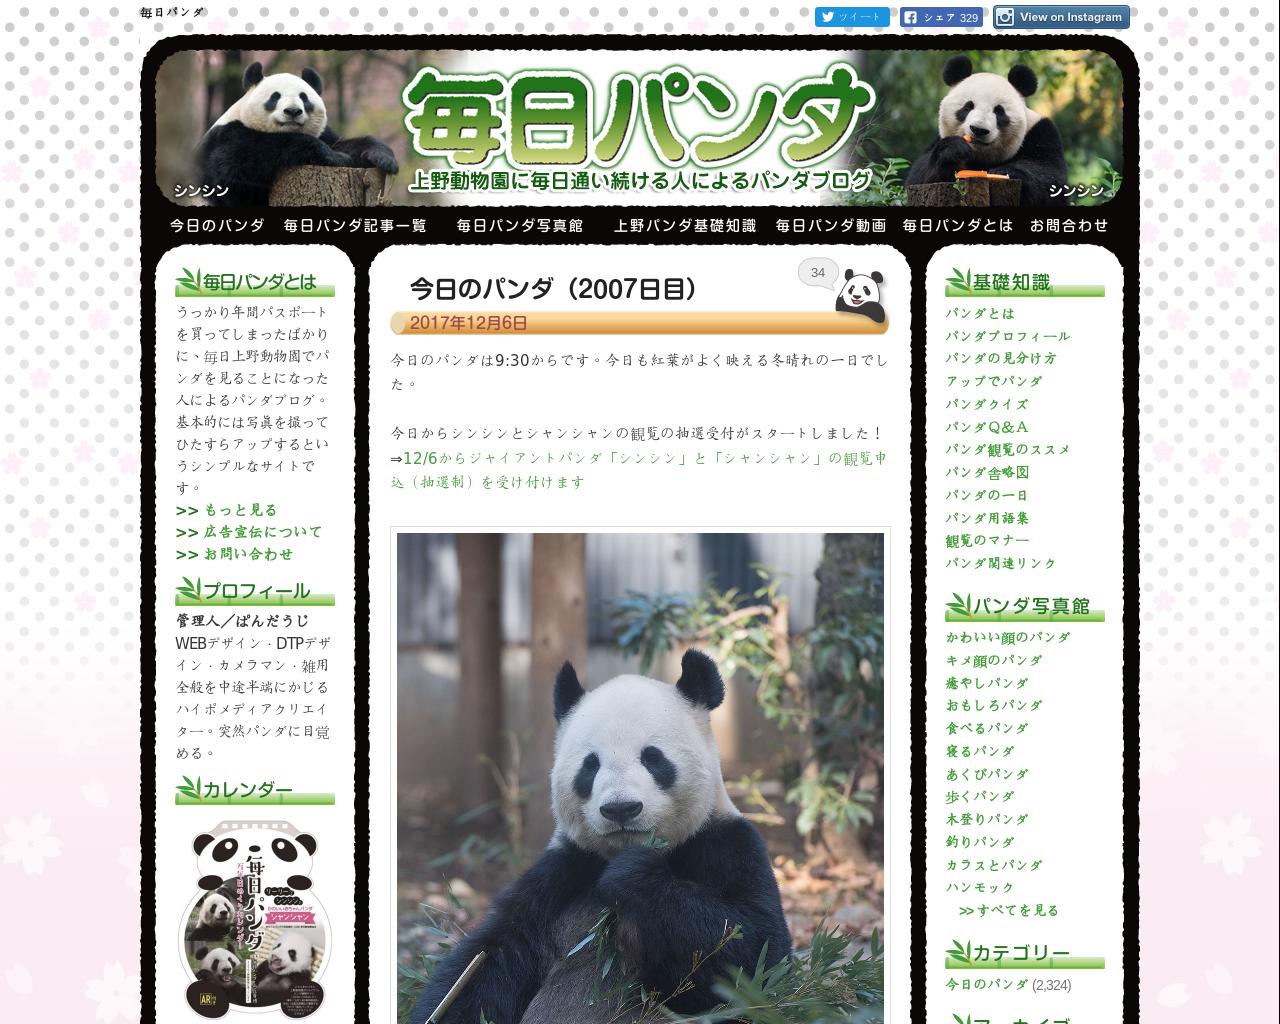 mainichi-panda.jp(2017/12/07 06:42:03)